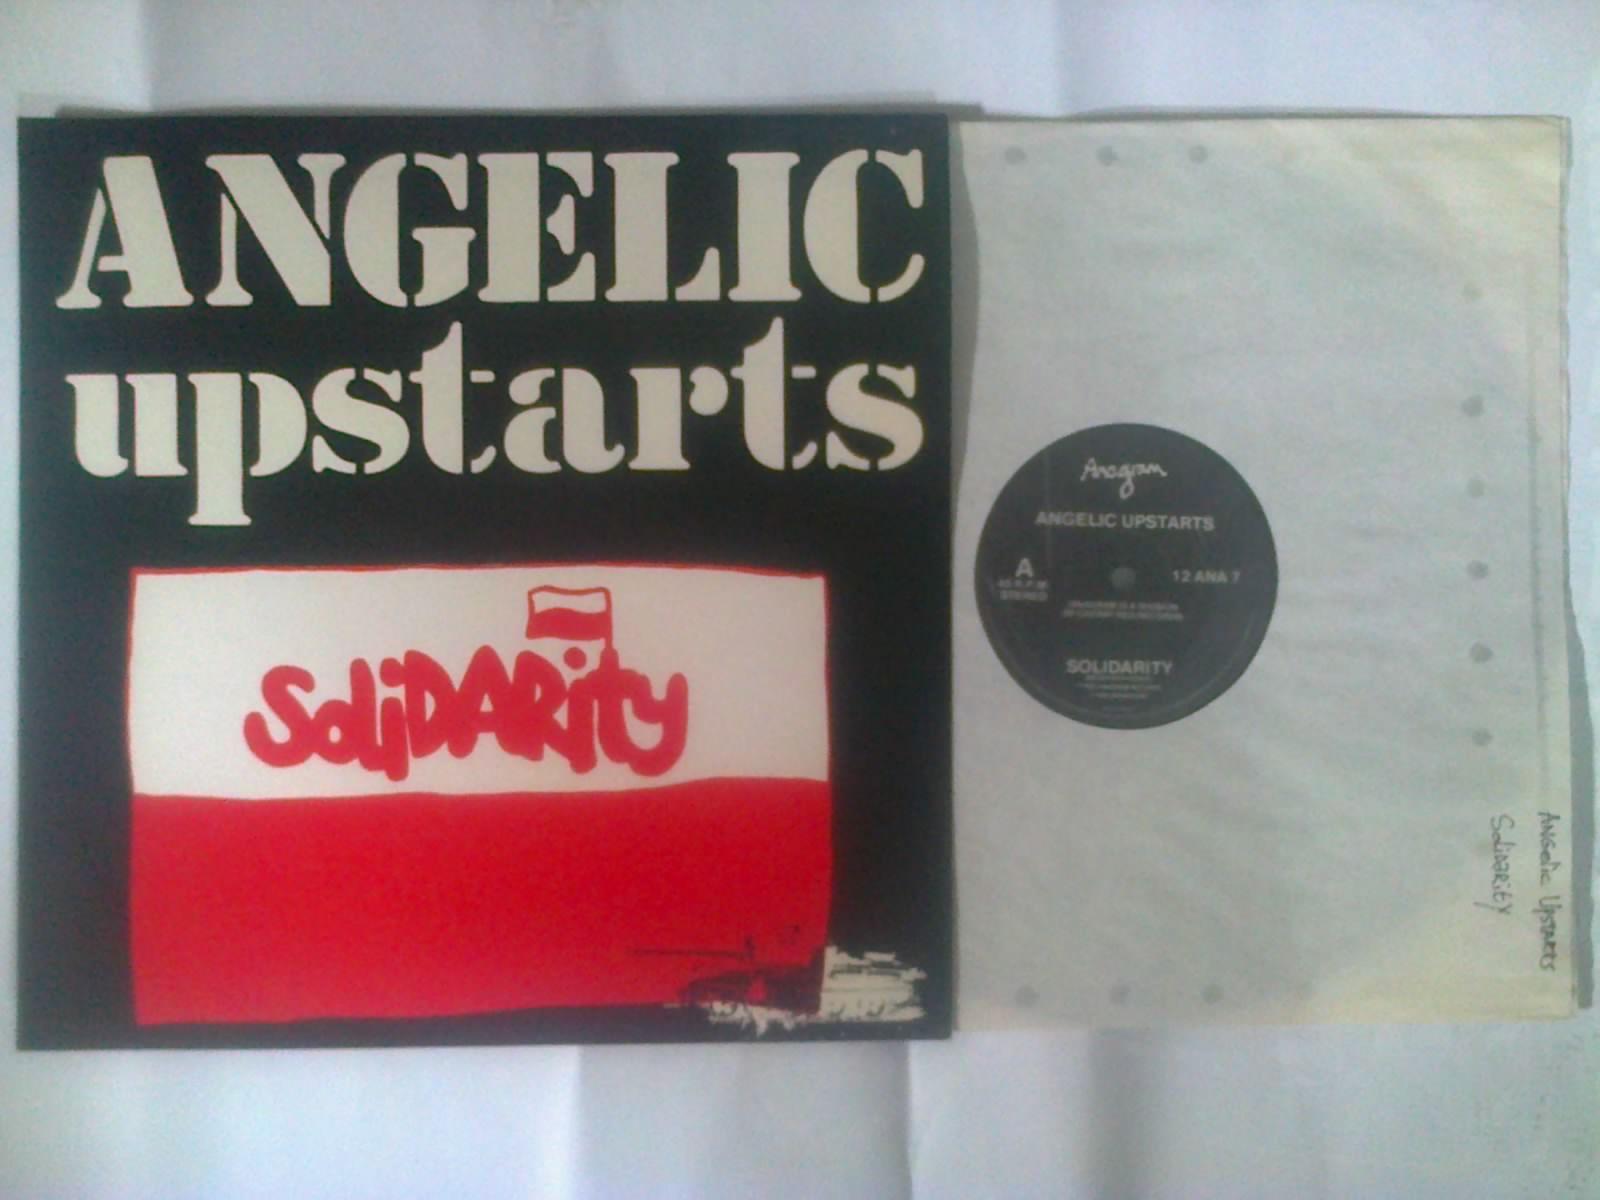 ANGELIC UPSTARTS - okładka płyty